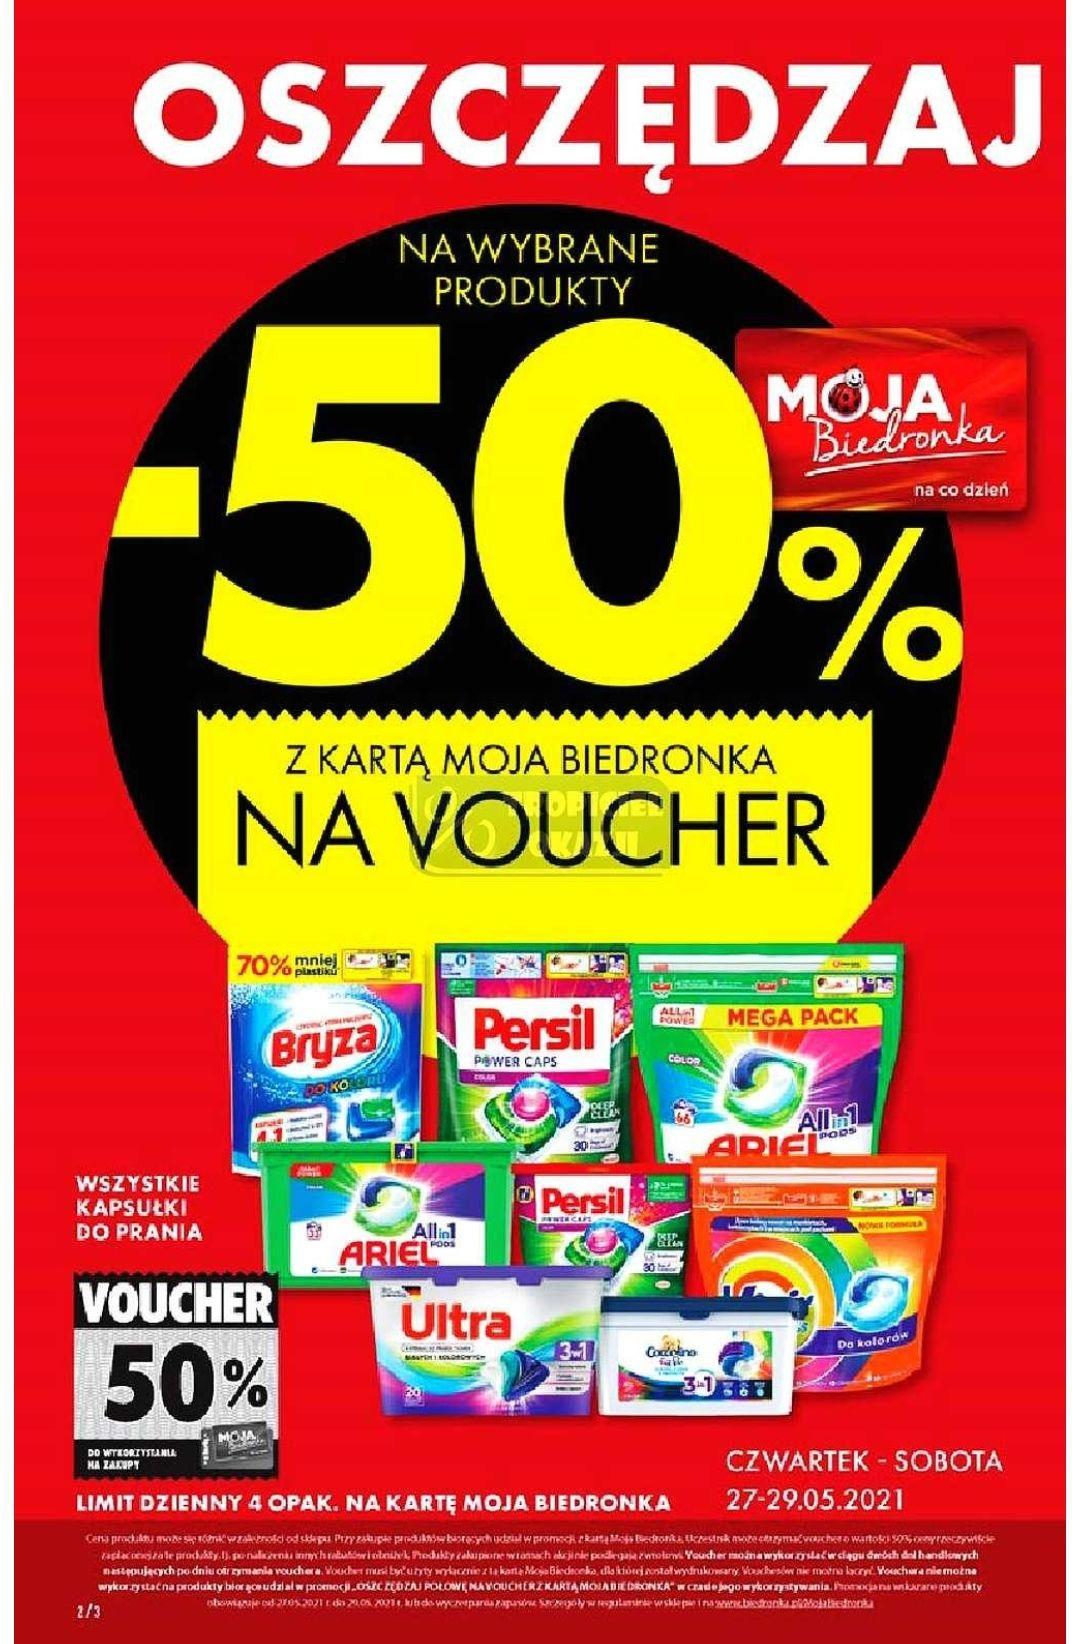 Biedronka kapsułki do prania 50% taniej na voucher